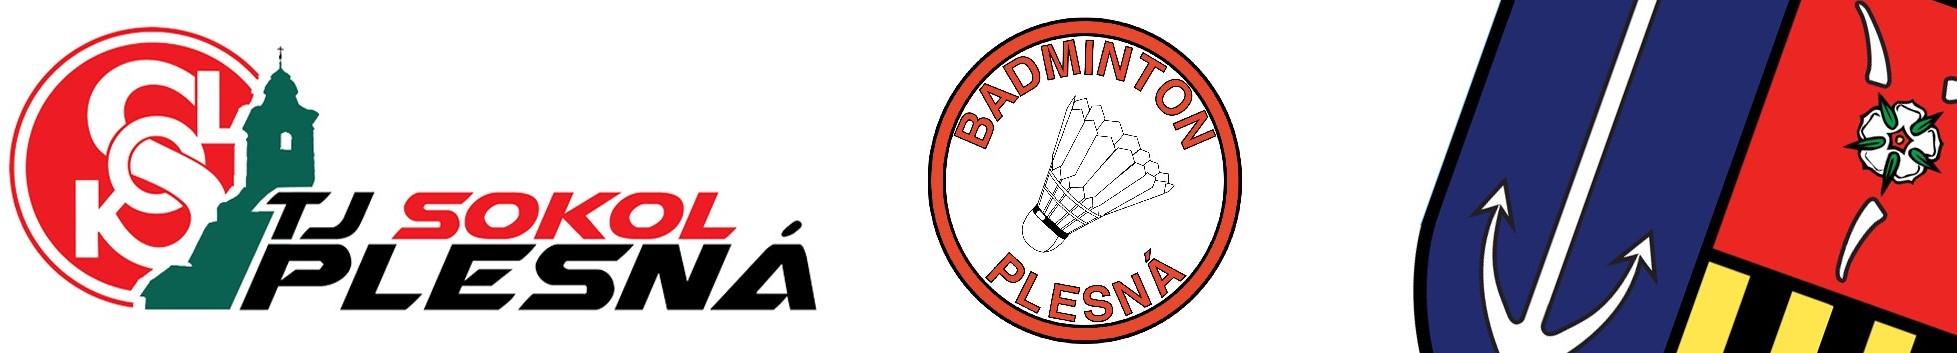 TJ Sokol Plesná, oddíl badmintonu